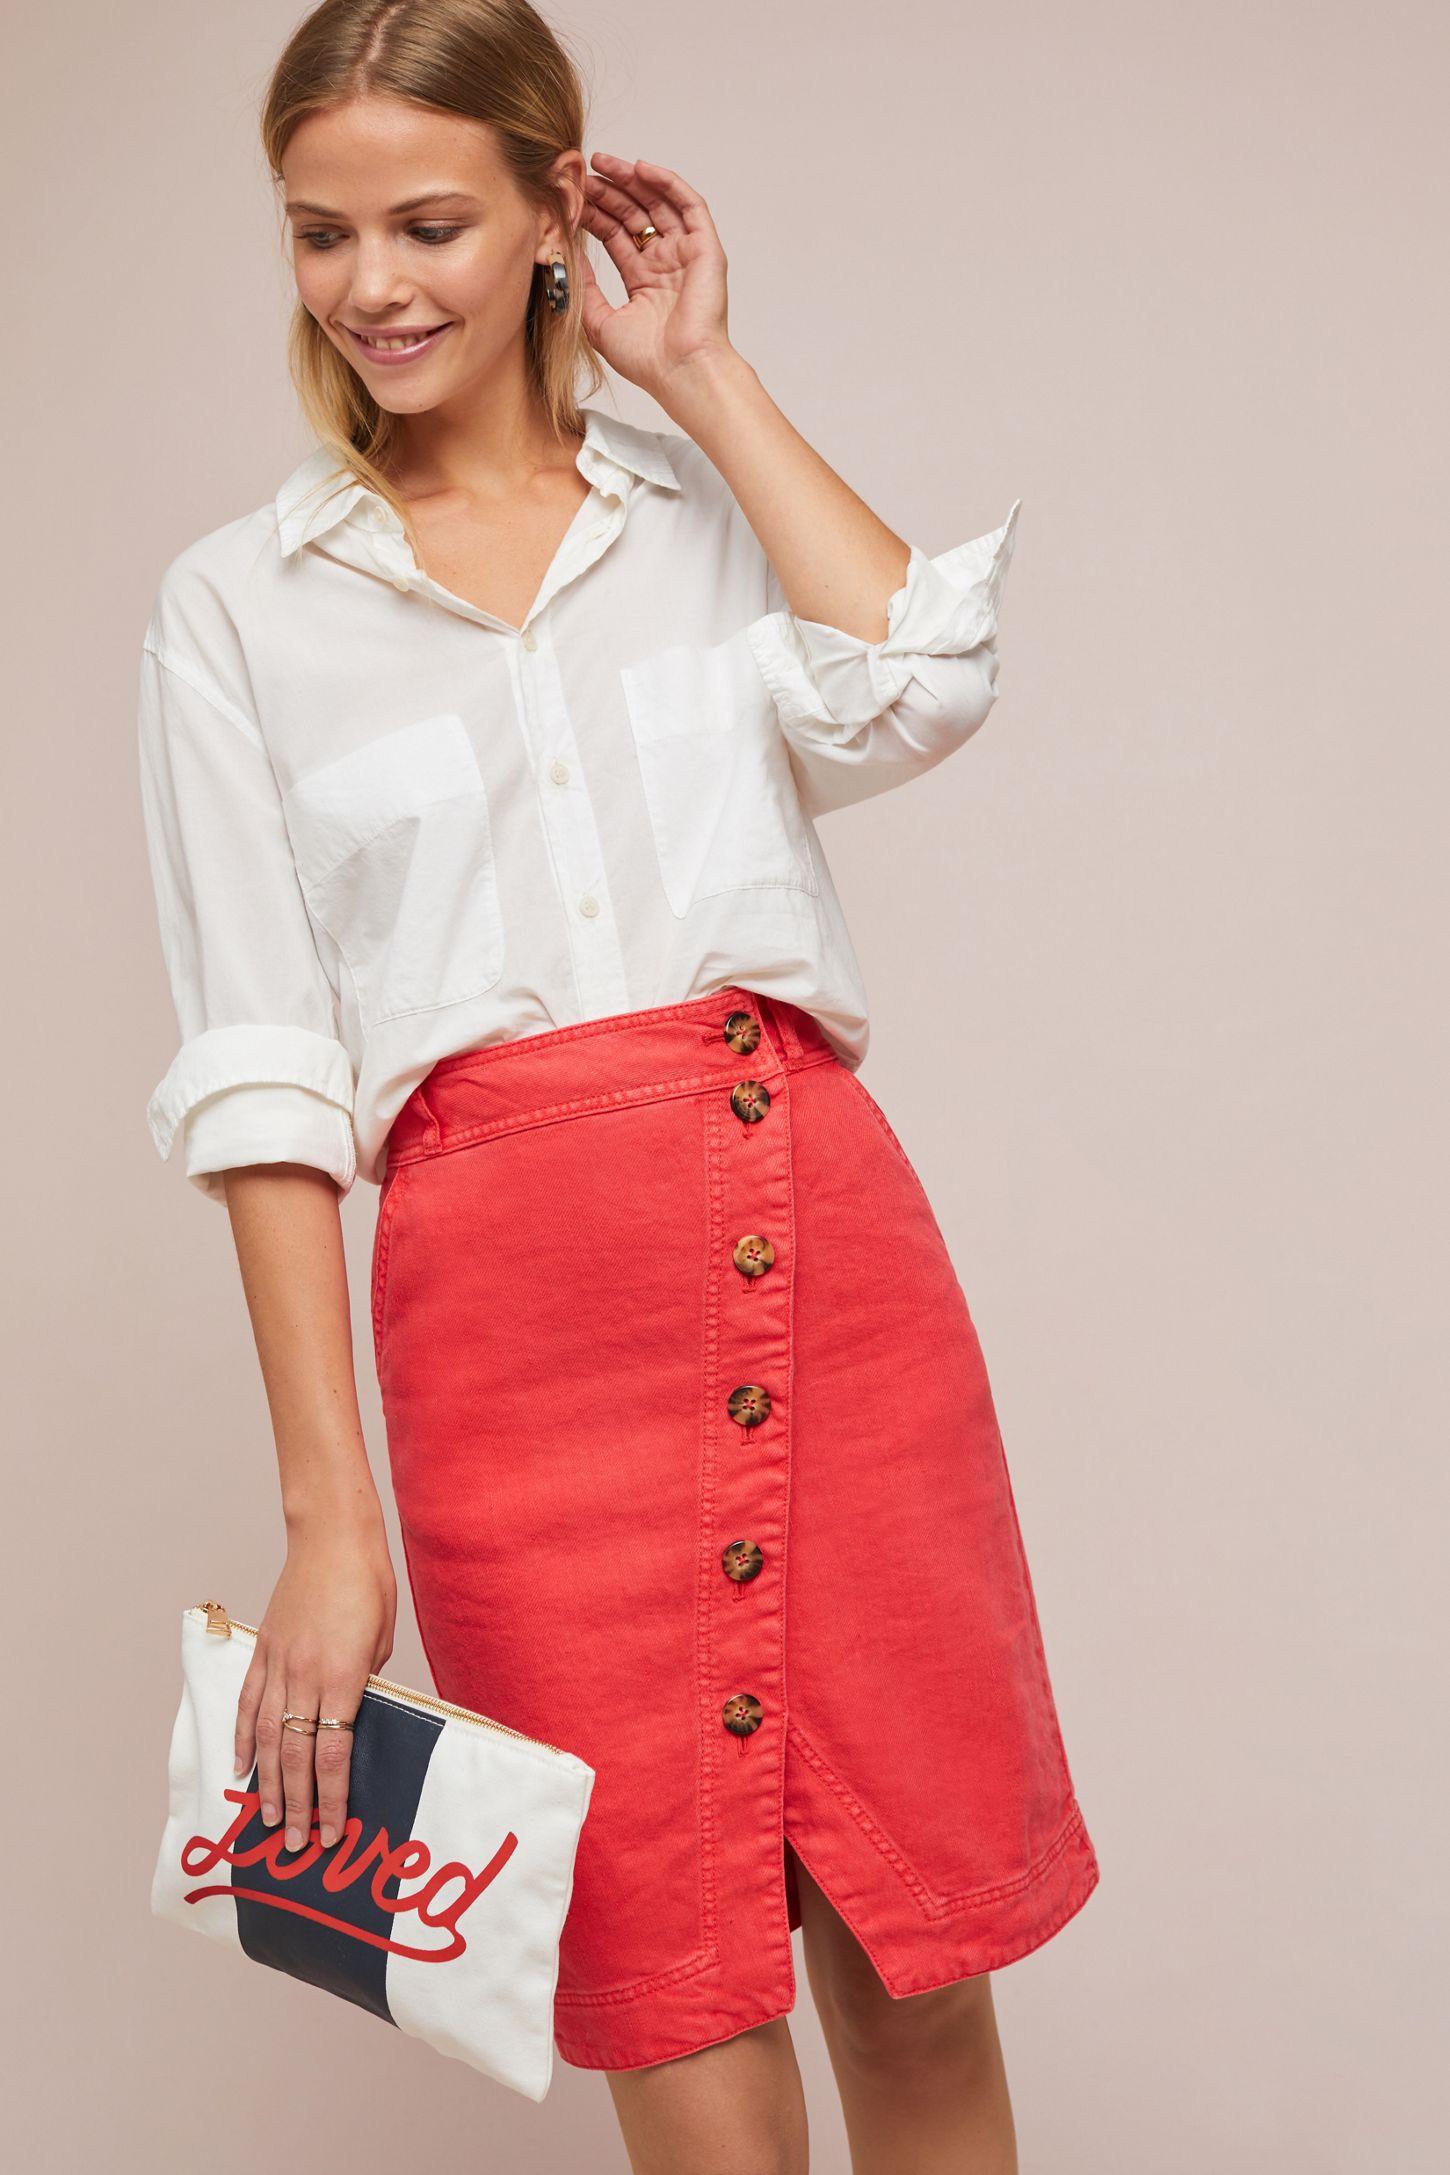 59a019130b5b7 Buttondown Pencil Skirt